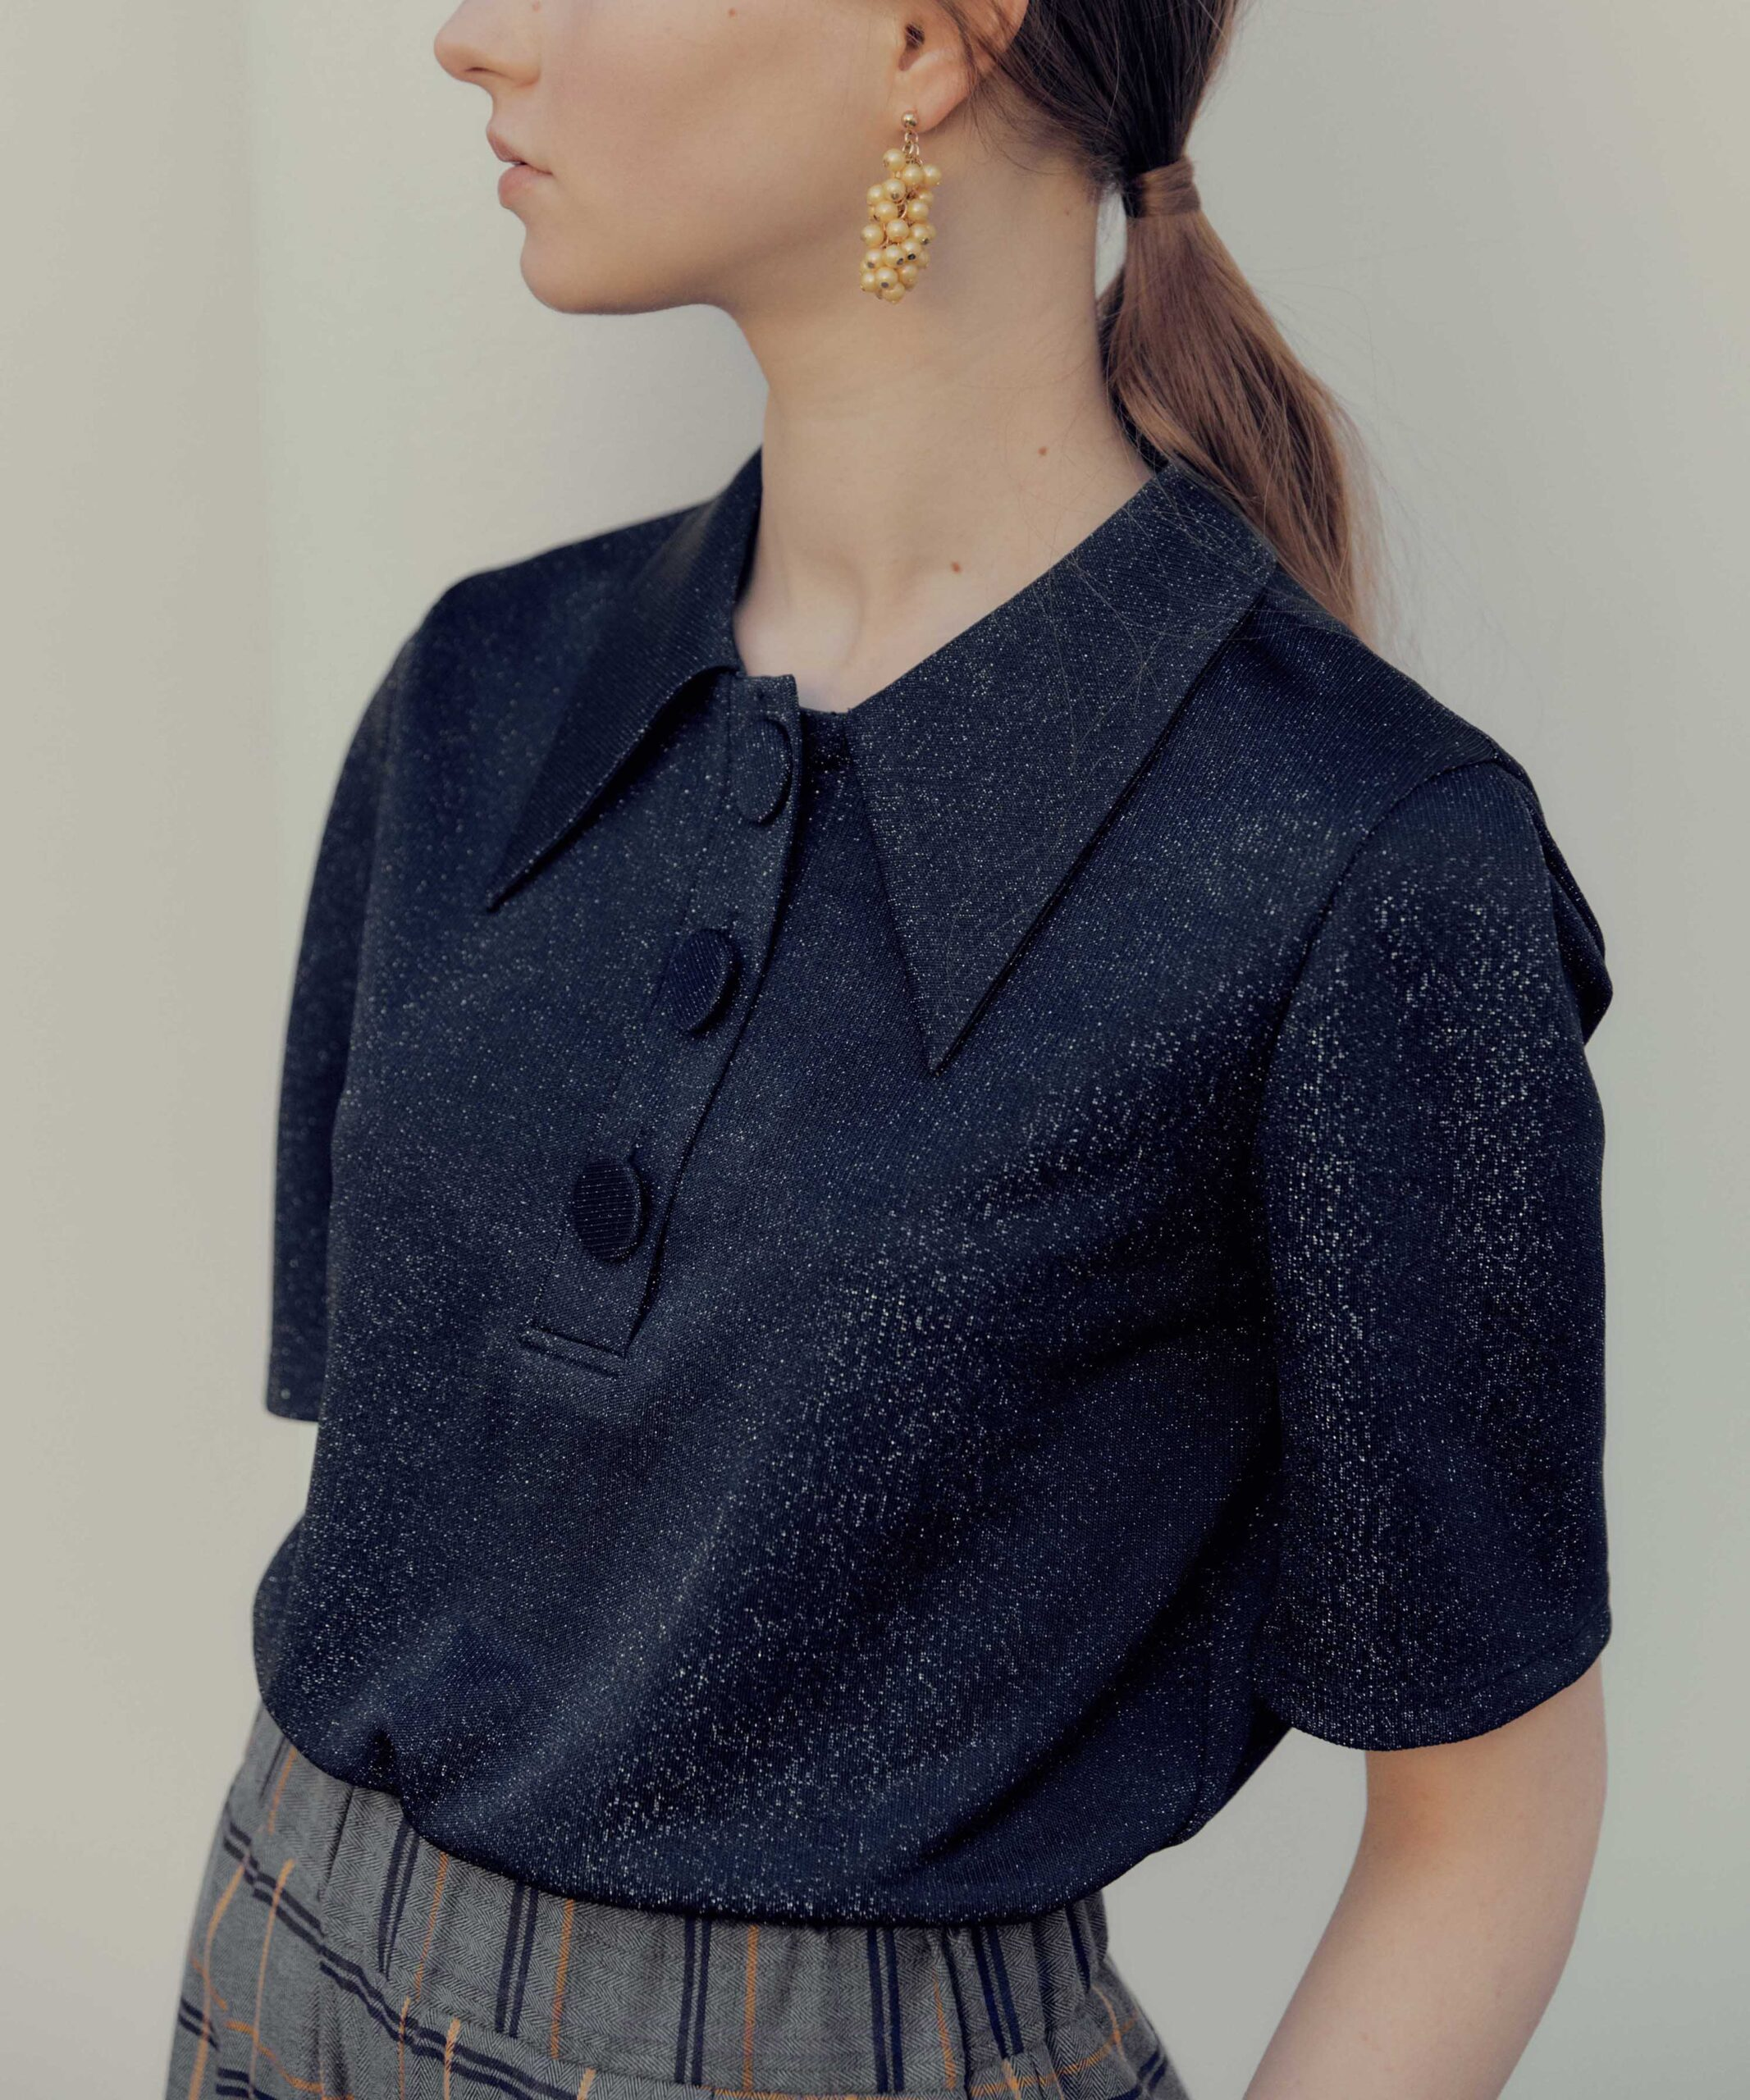 Hidden forest market   Korean fashion designer available at The Dallant, Korean fashion online shopping site